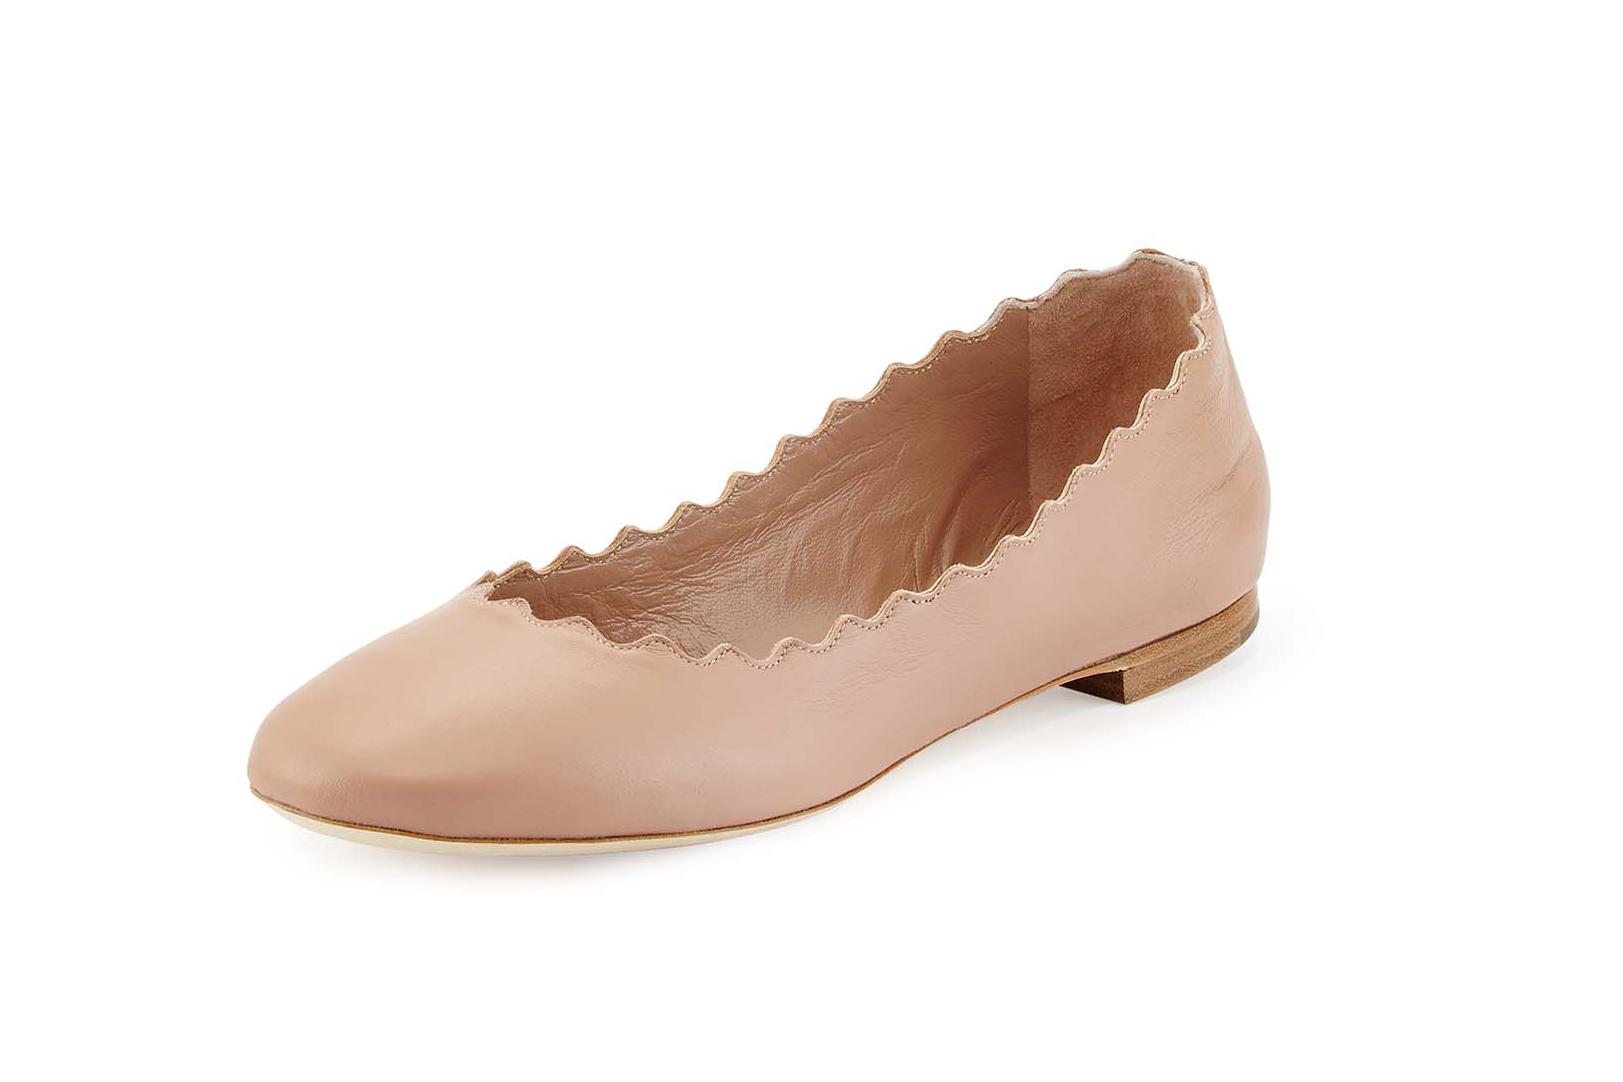 Chloé's staple shoe design - the Lauren ballet flat.